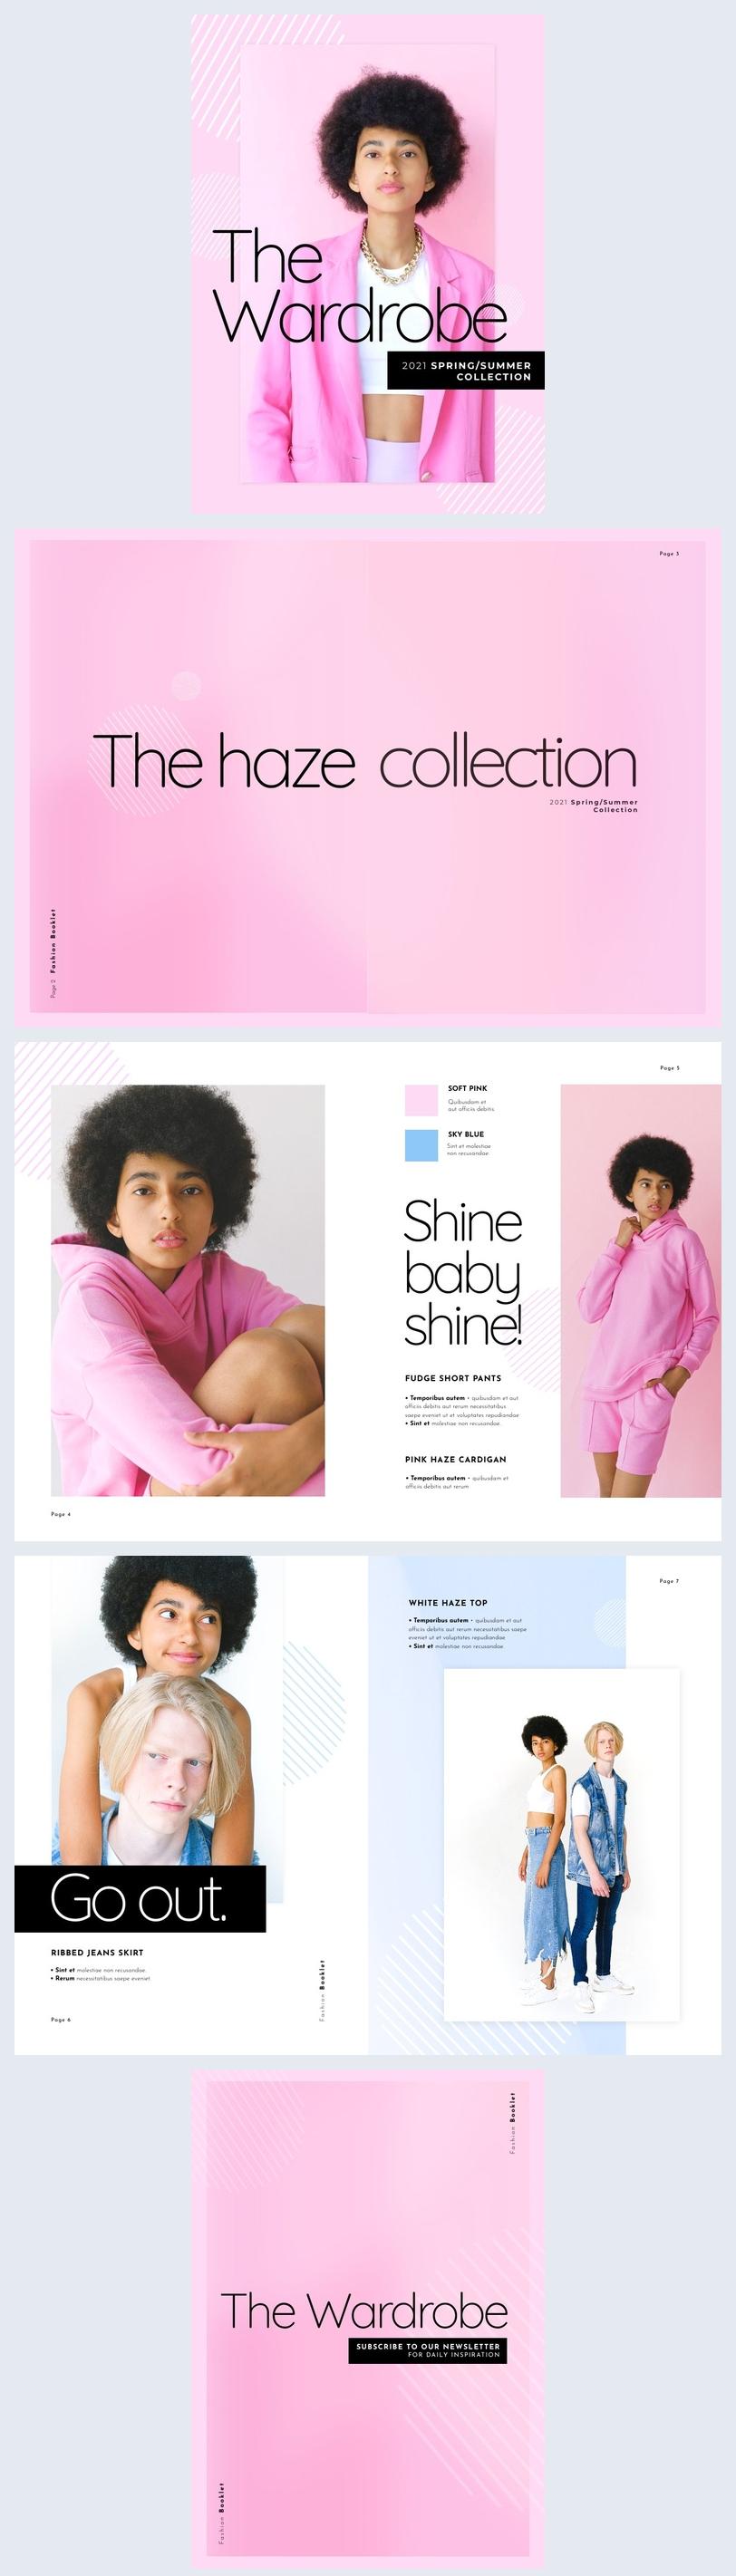 Exemplo de Design de Lookbook de Moda